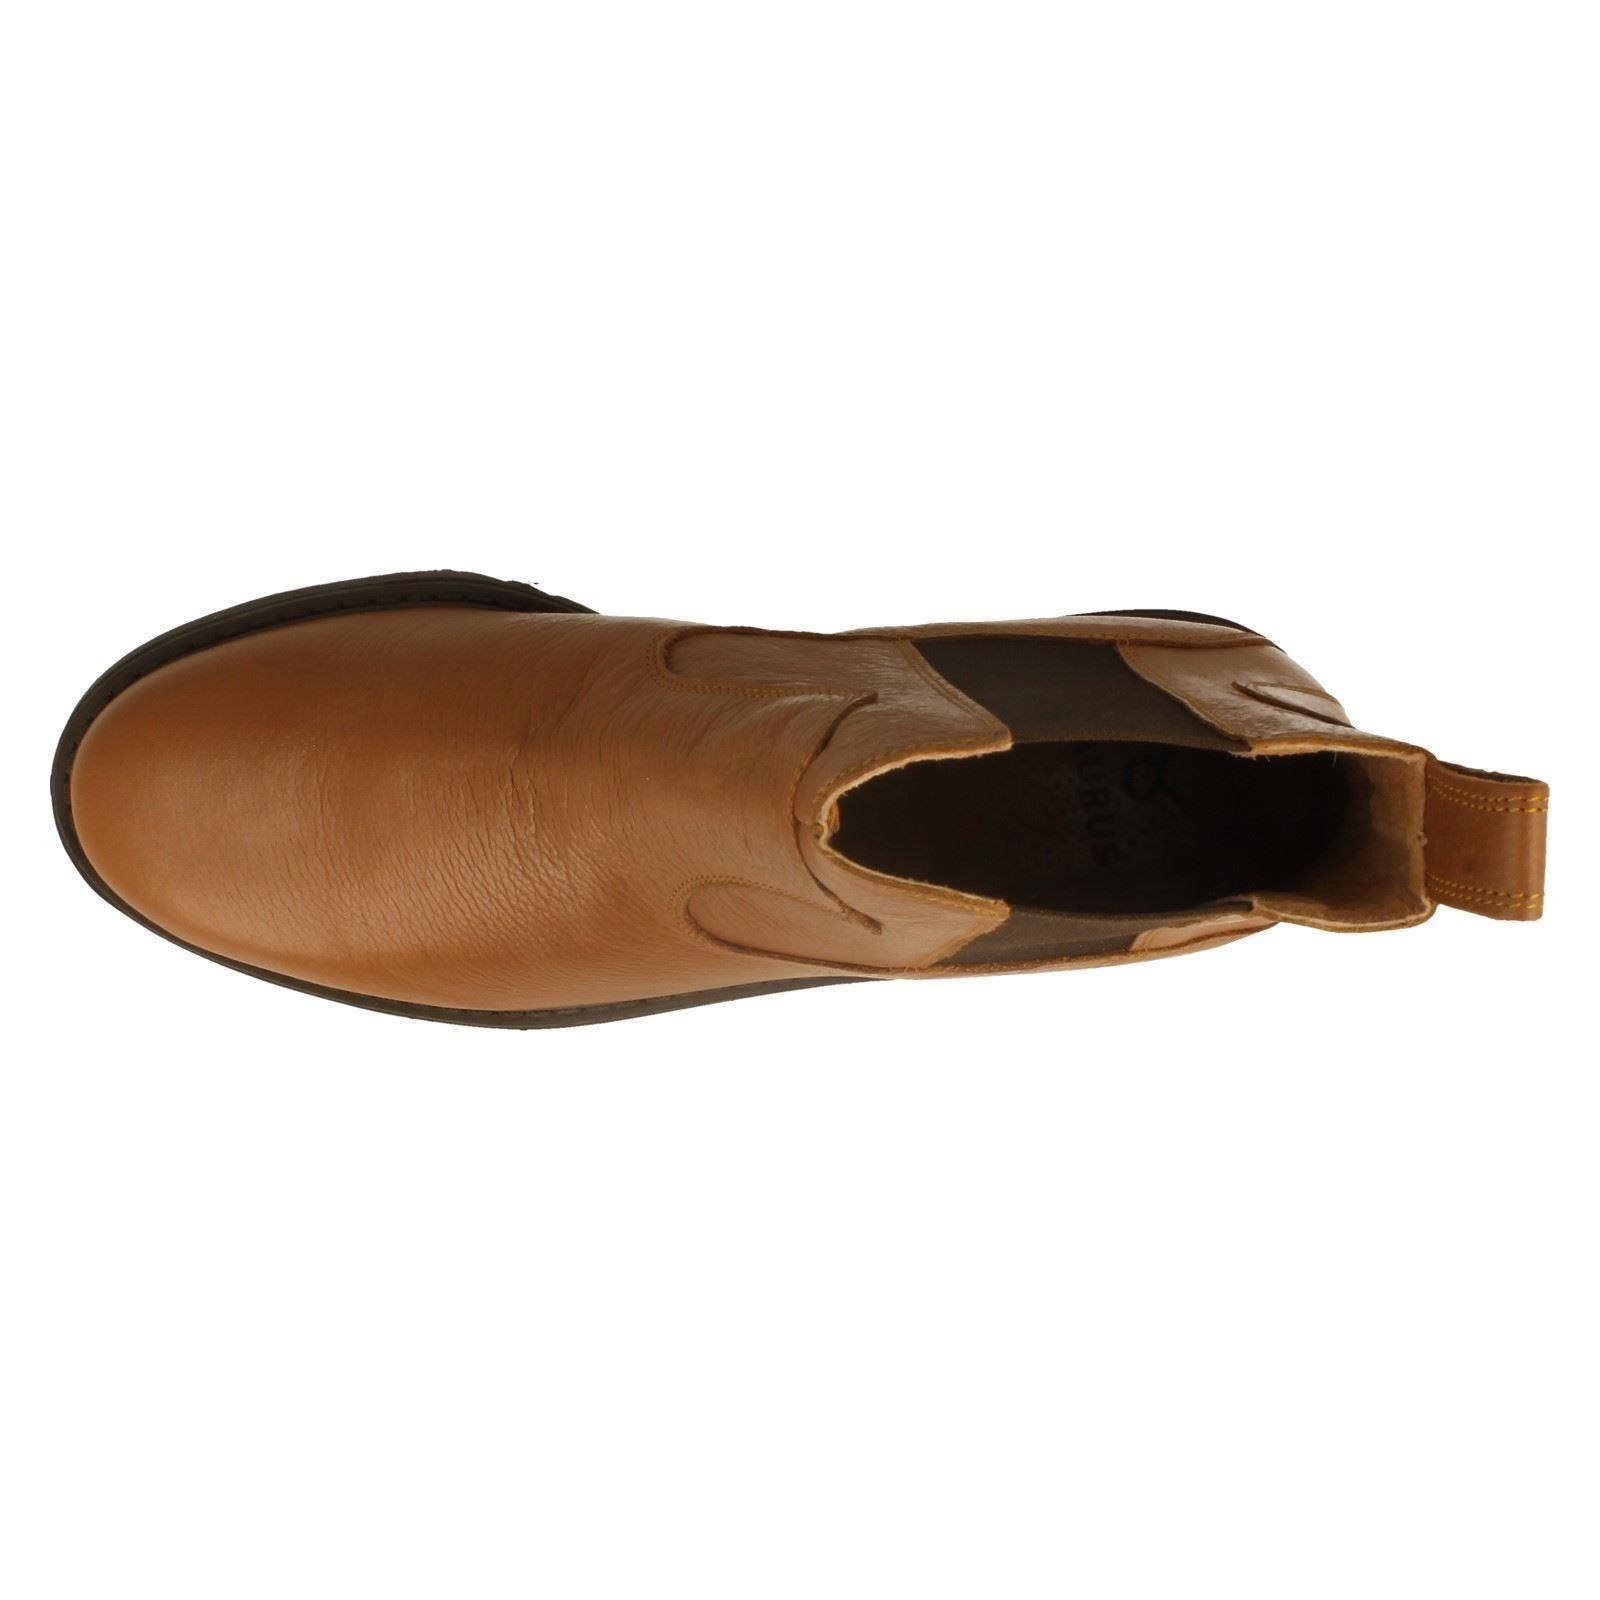 Billig Mens hohe Qualität Mens Billig Taurus Jodphur Boots Breckland-W b98e13